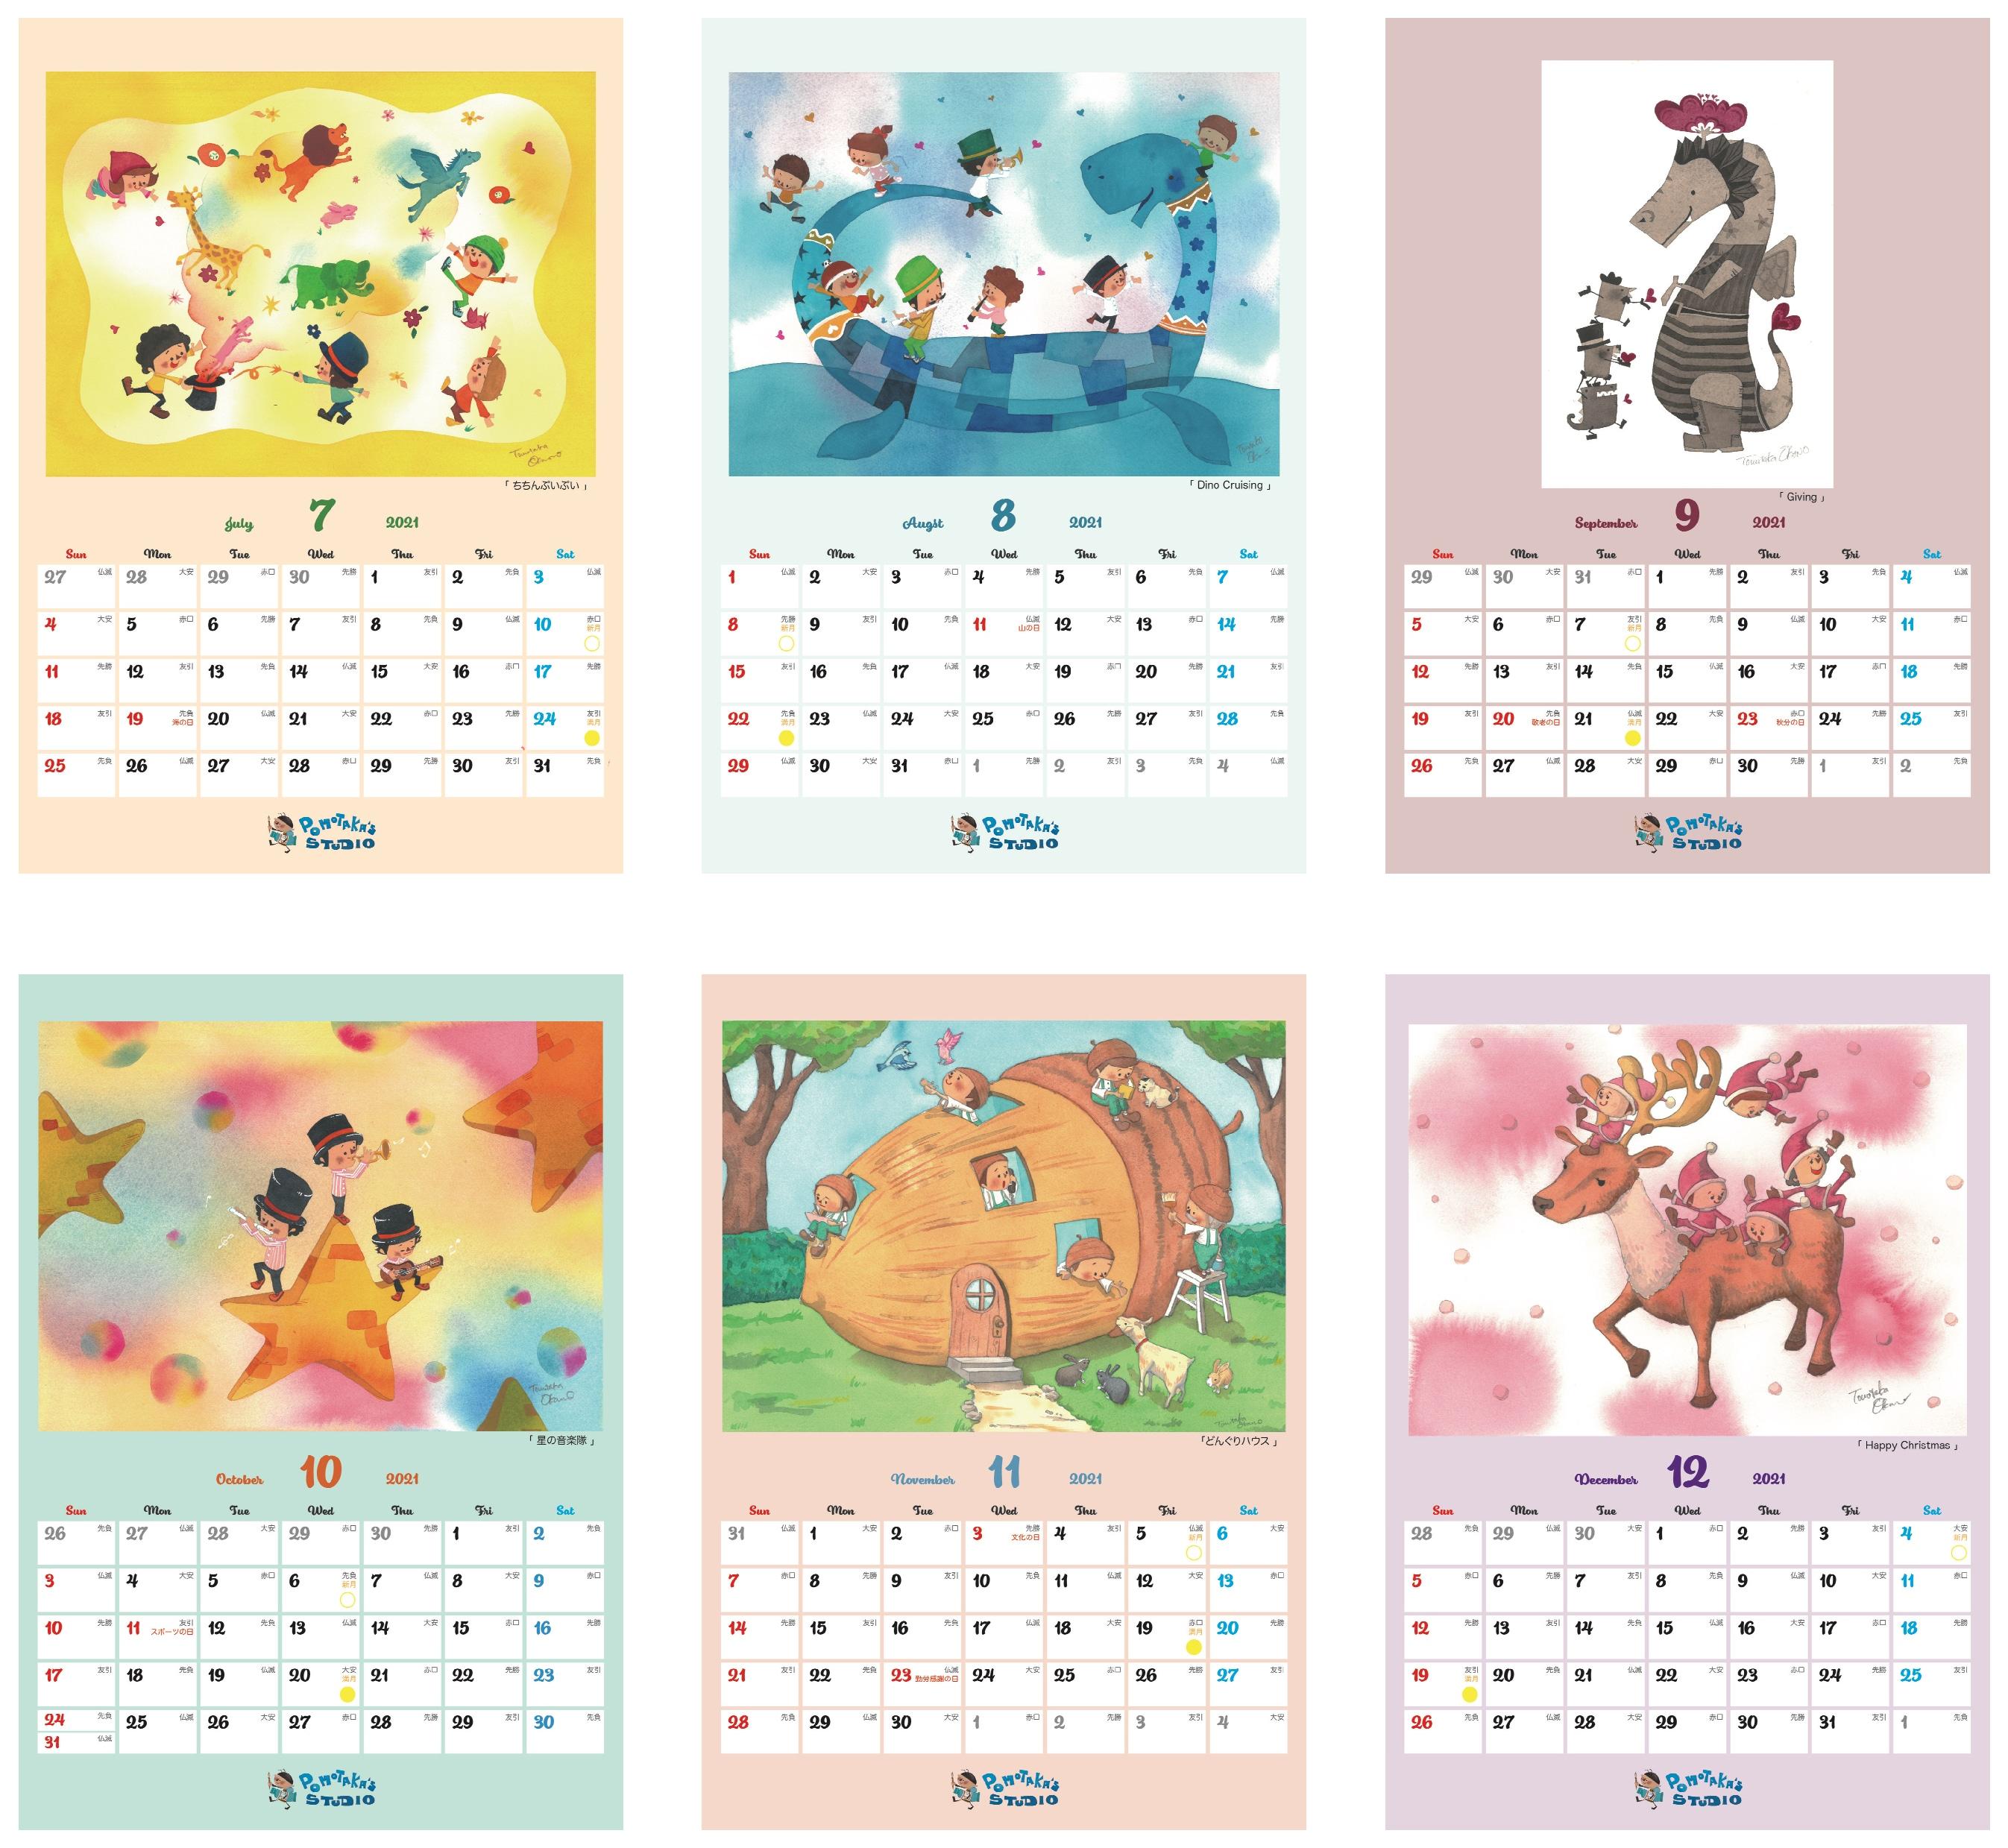 A3壁掛けカレンダー7月8月9月10月11月12月_Pomotaka's Studio_岡野友敬